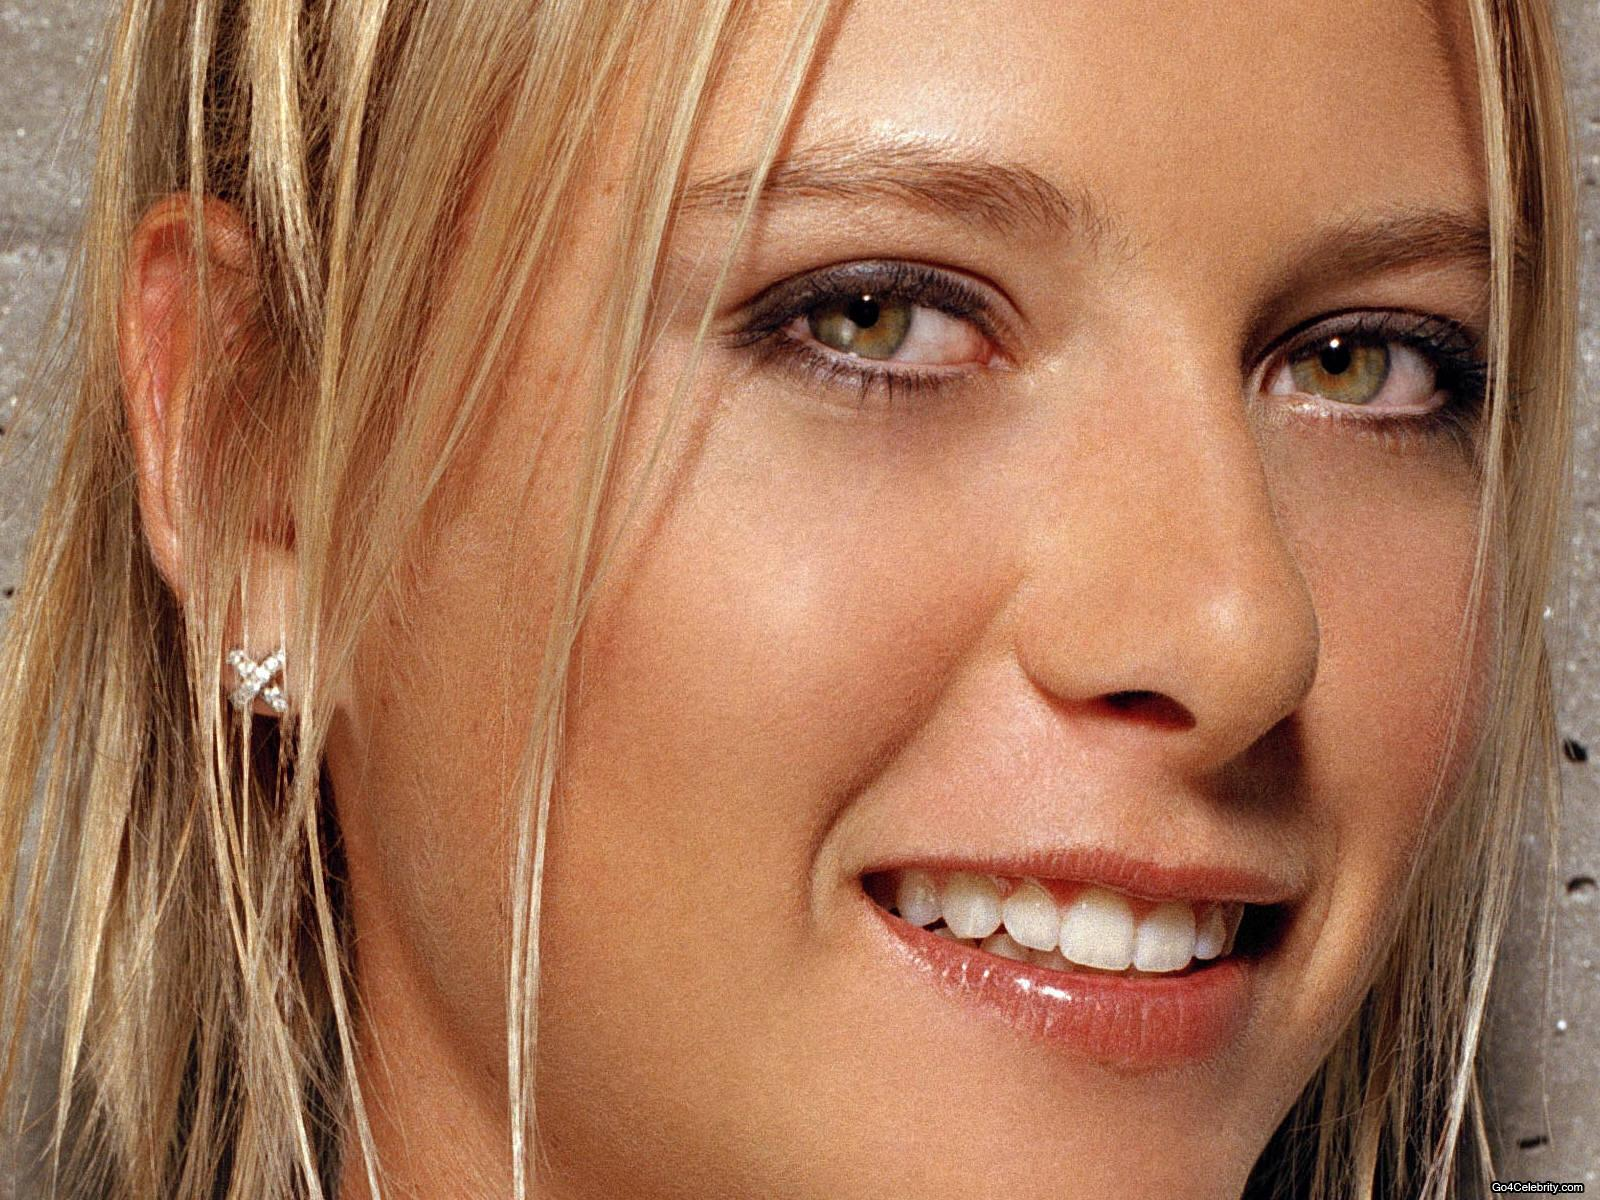 2004 number 1 singles uk dating 7